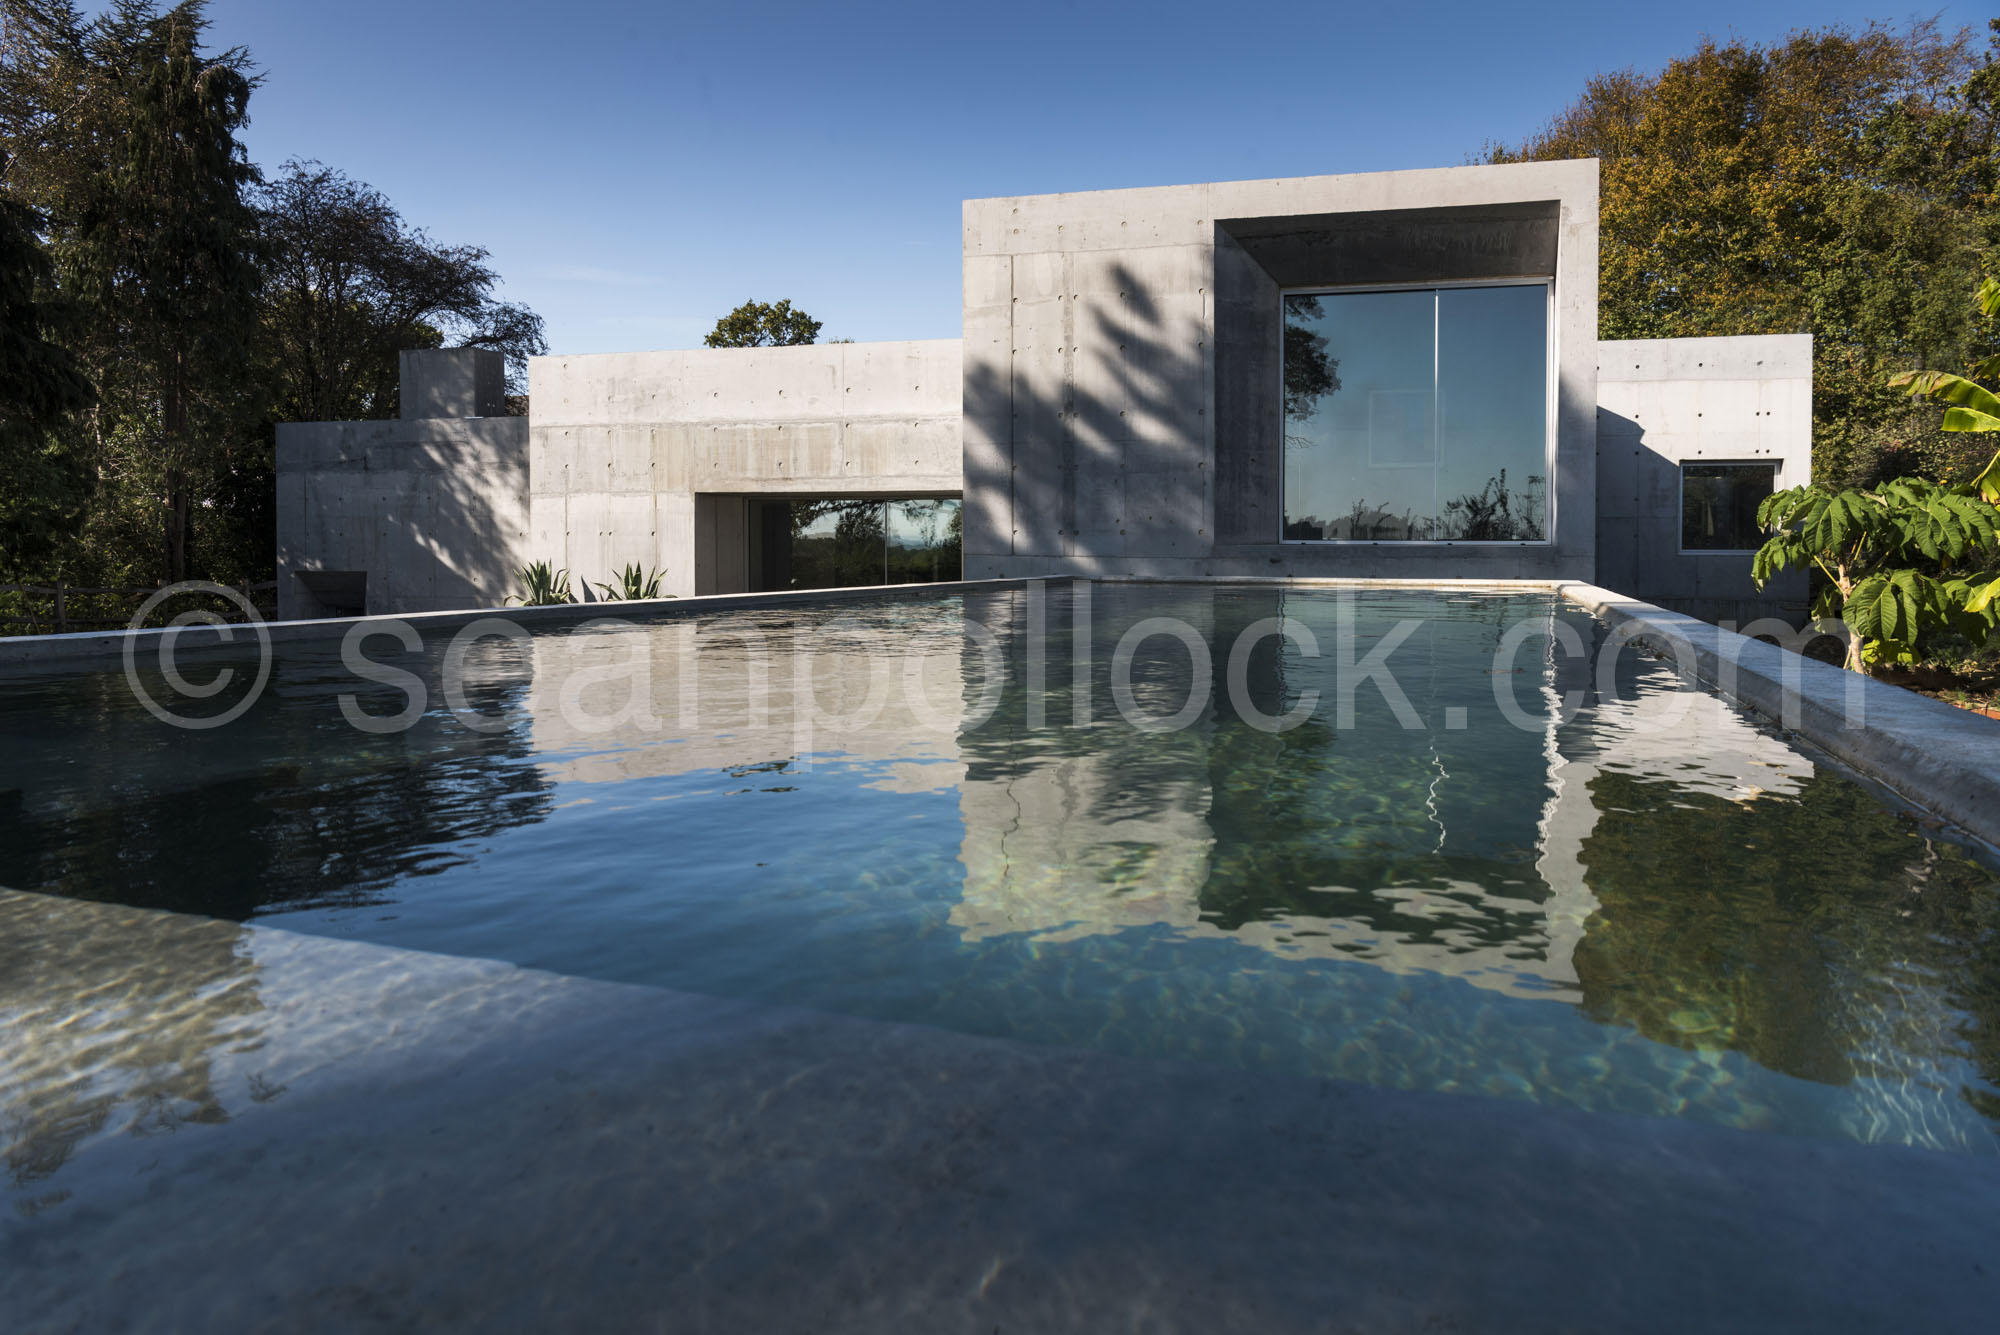 concretehouse-13.jpg